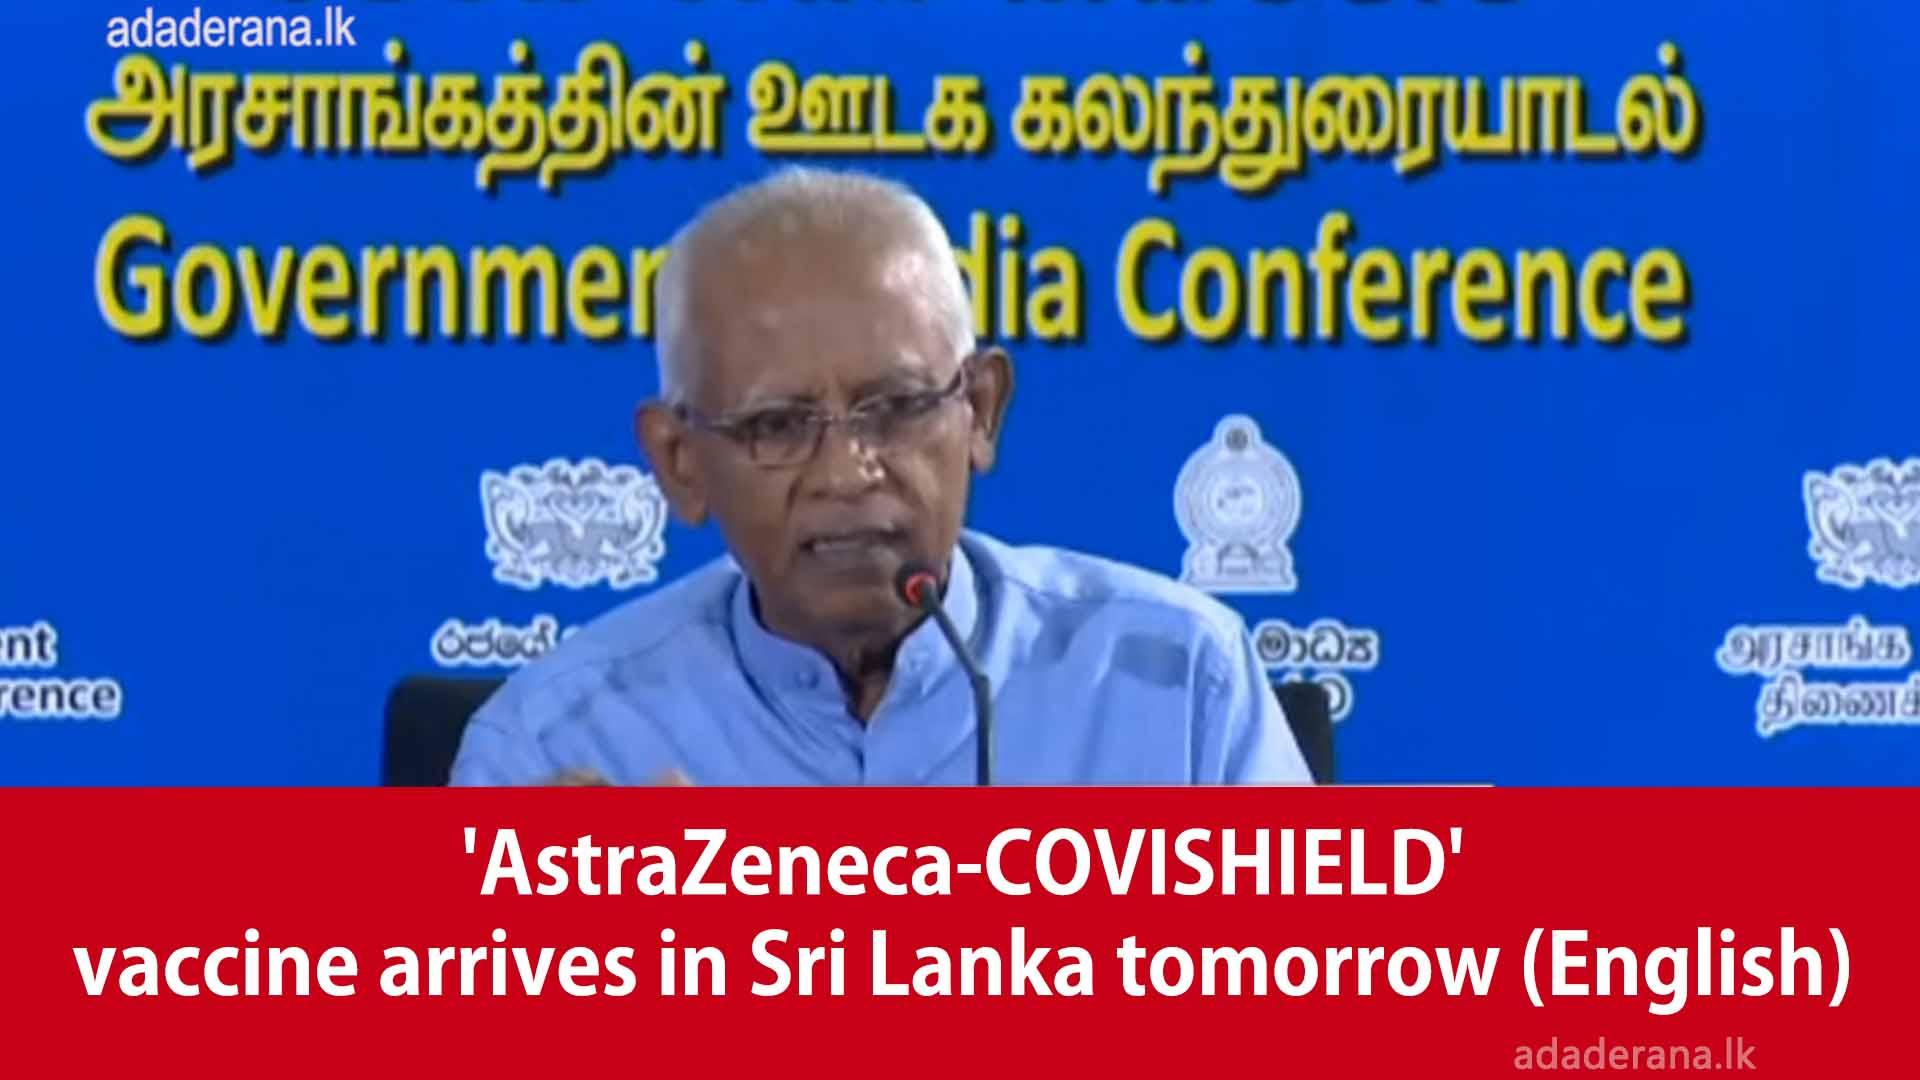 'AstraZeneca-COVISHIELD' vaccine arrives in Sri Lanka tomorrow (English)